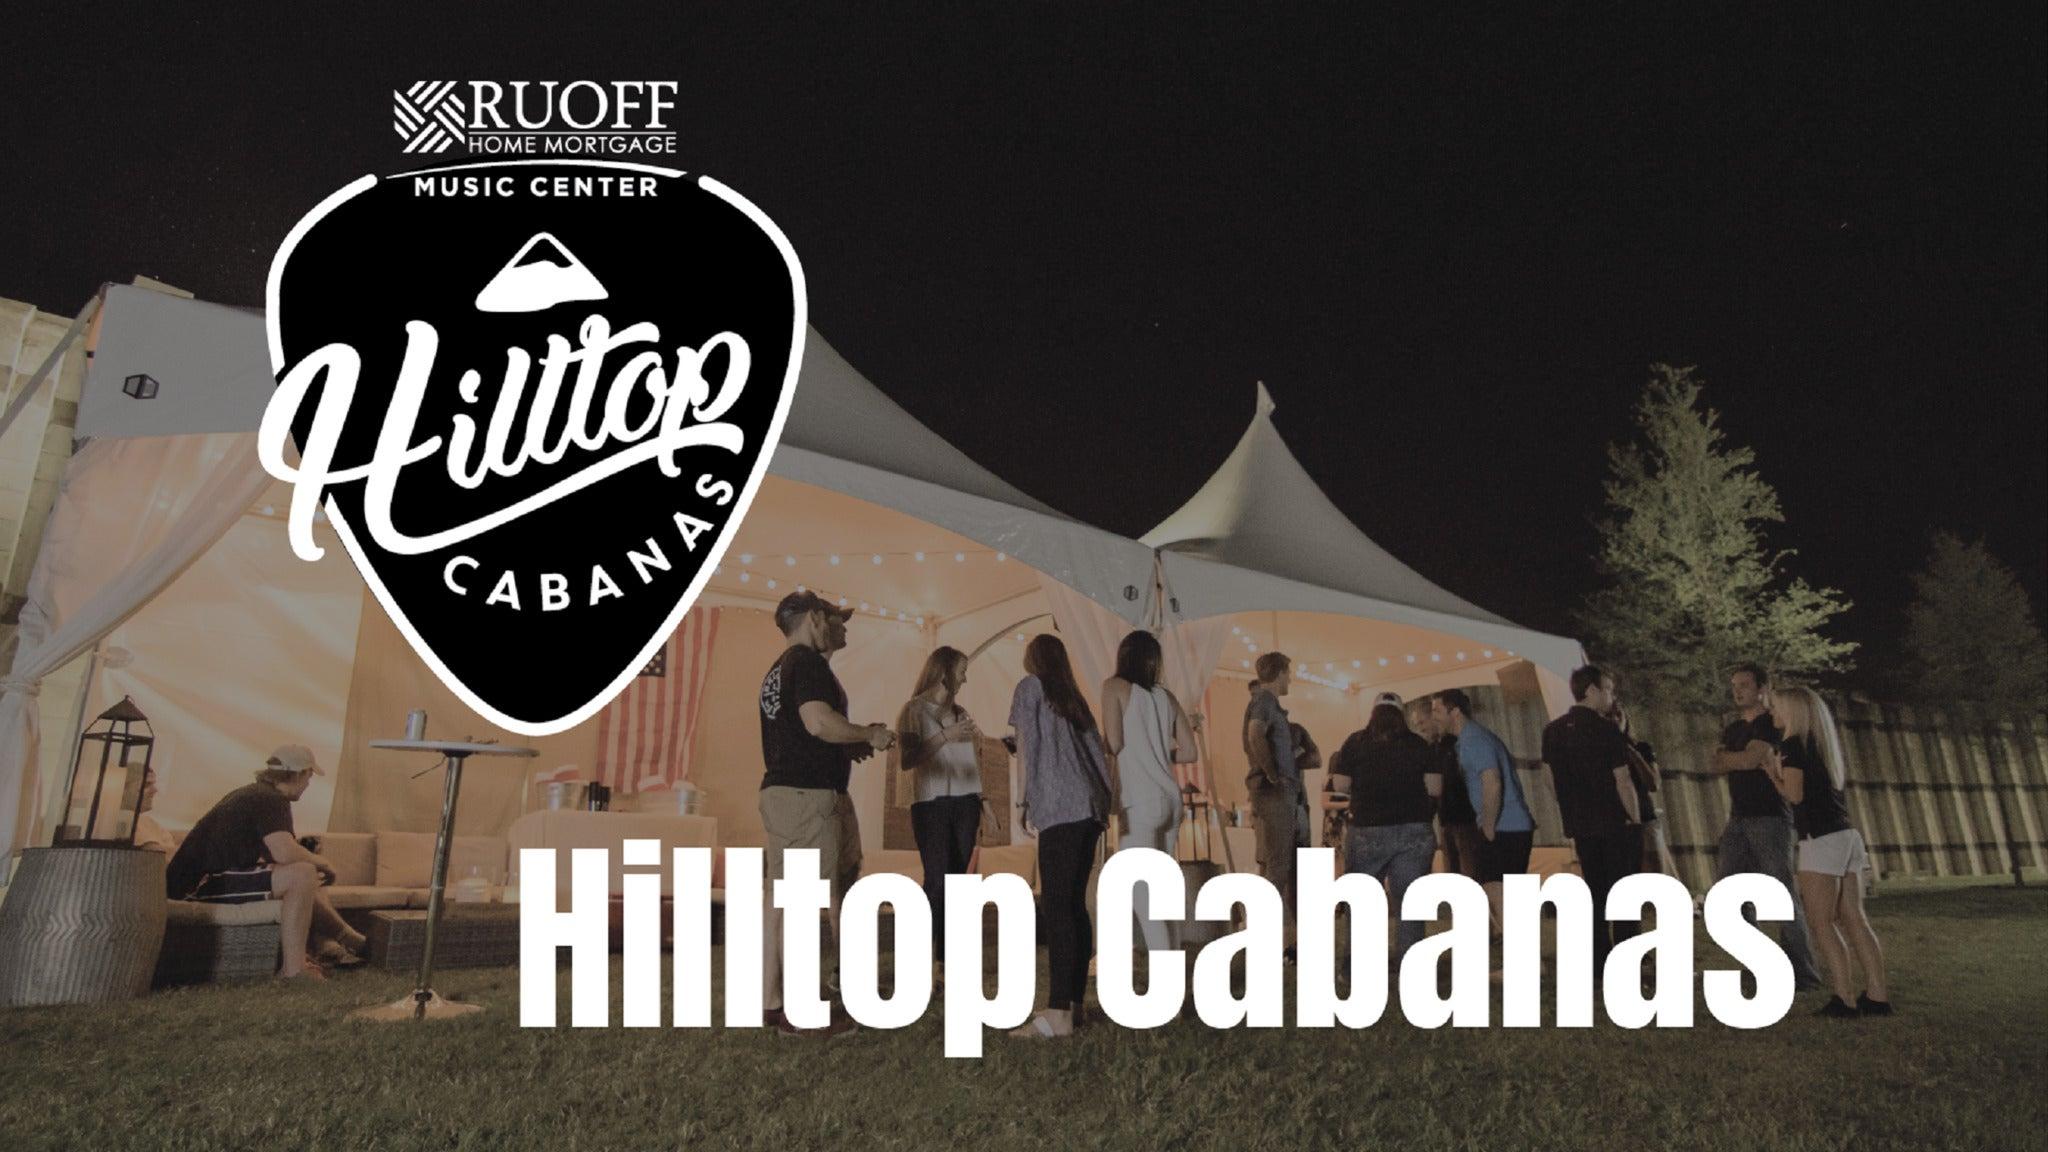 Hilltop Camp Cabanas: Kesha and Macklemore